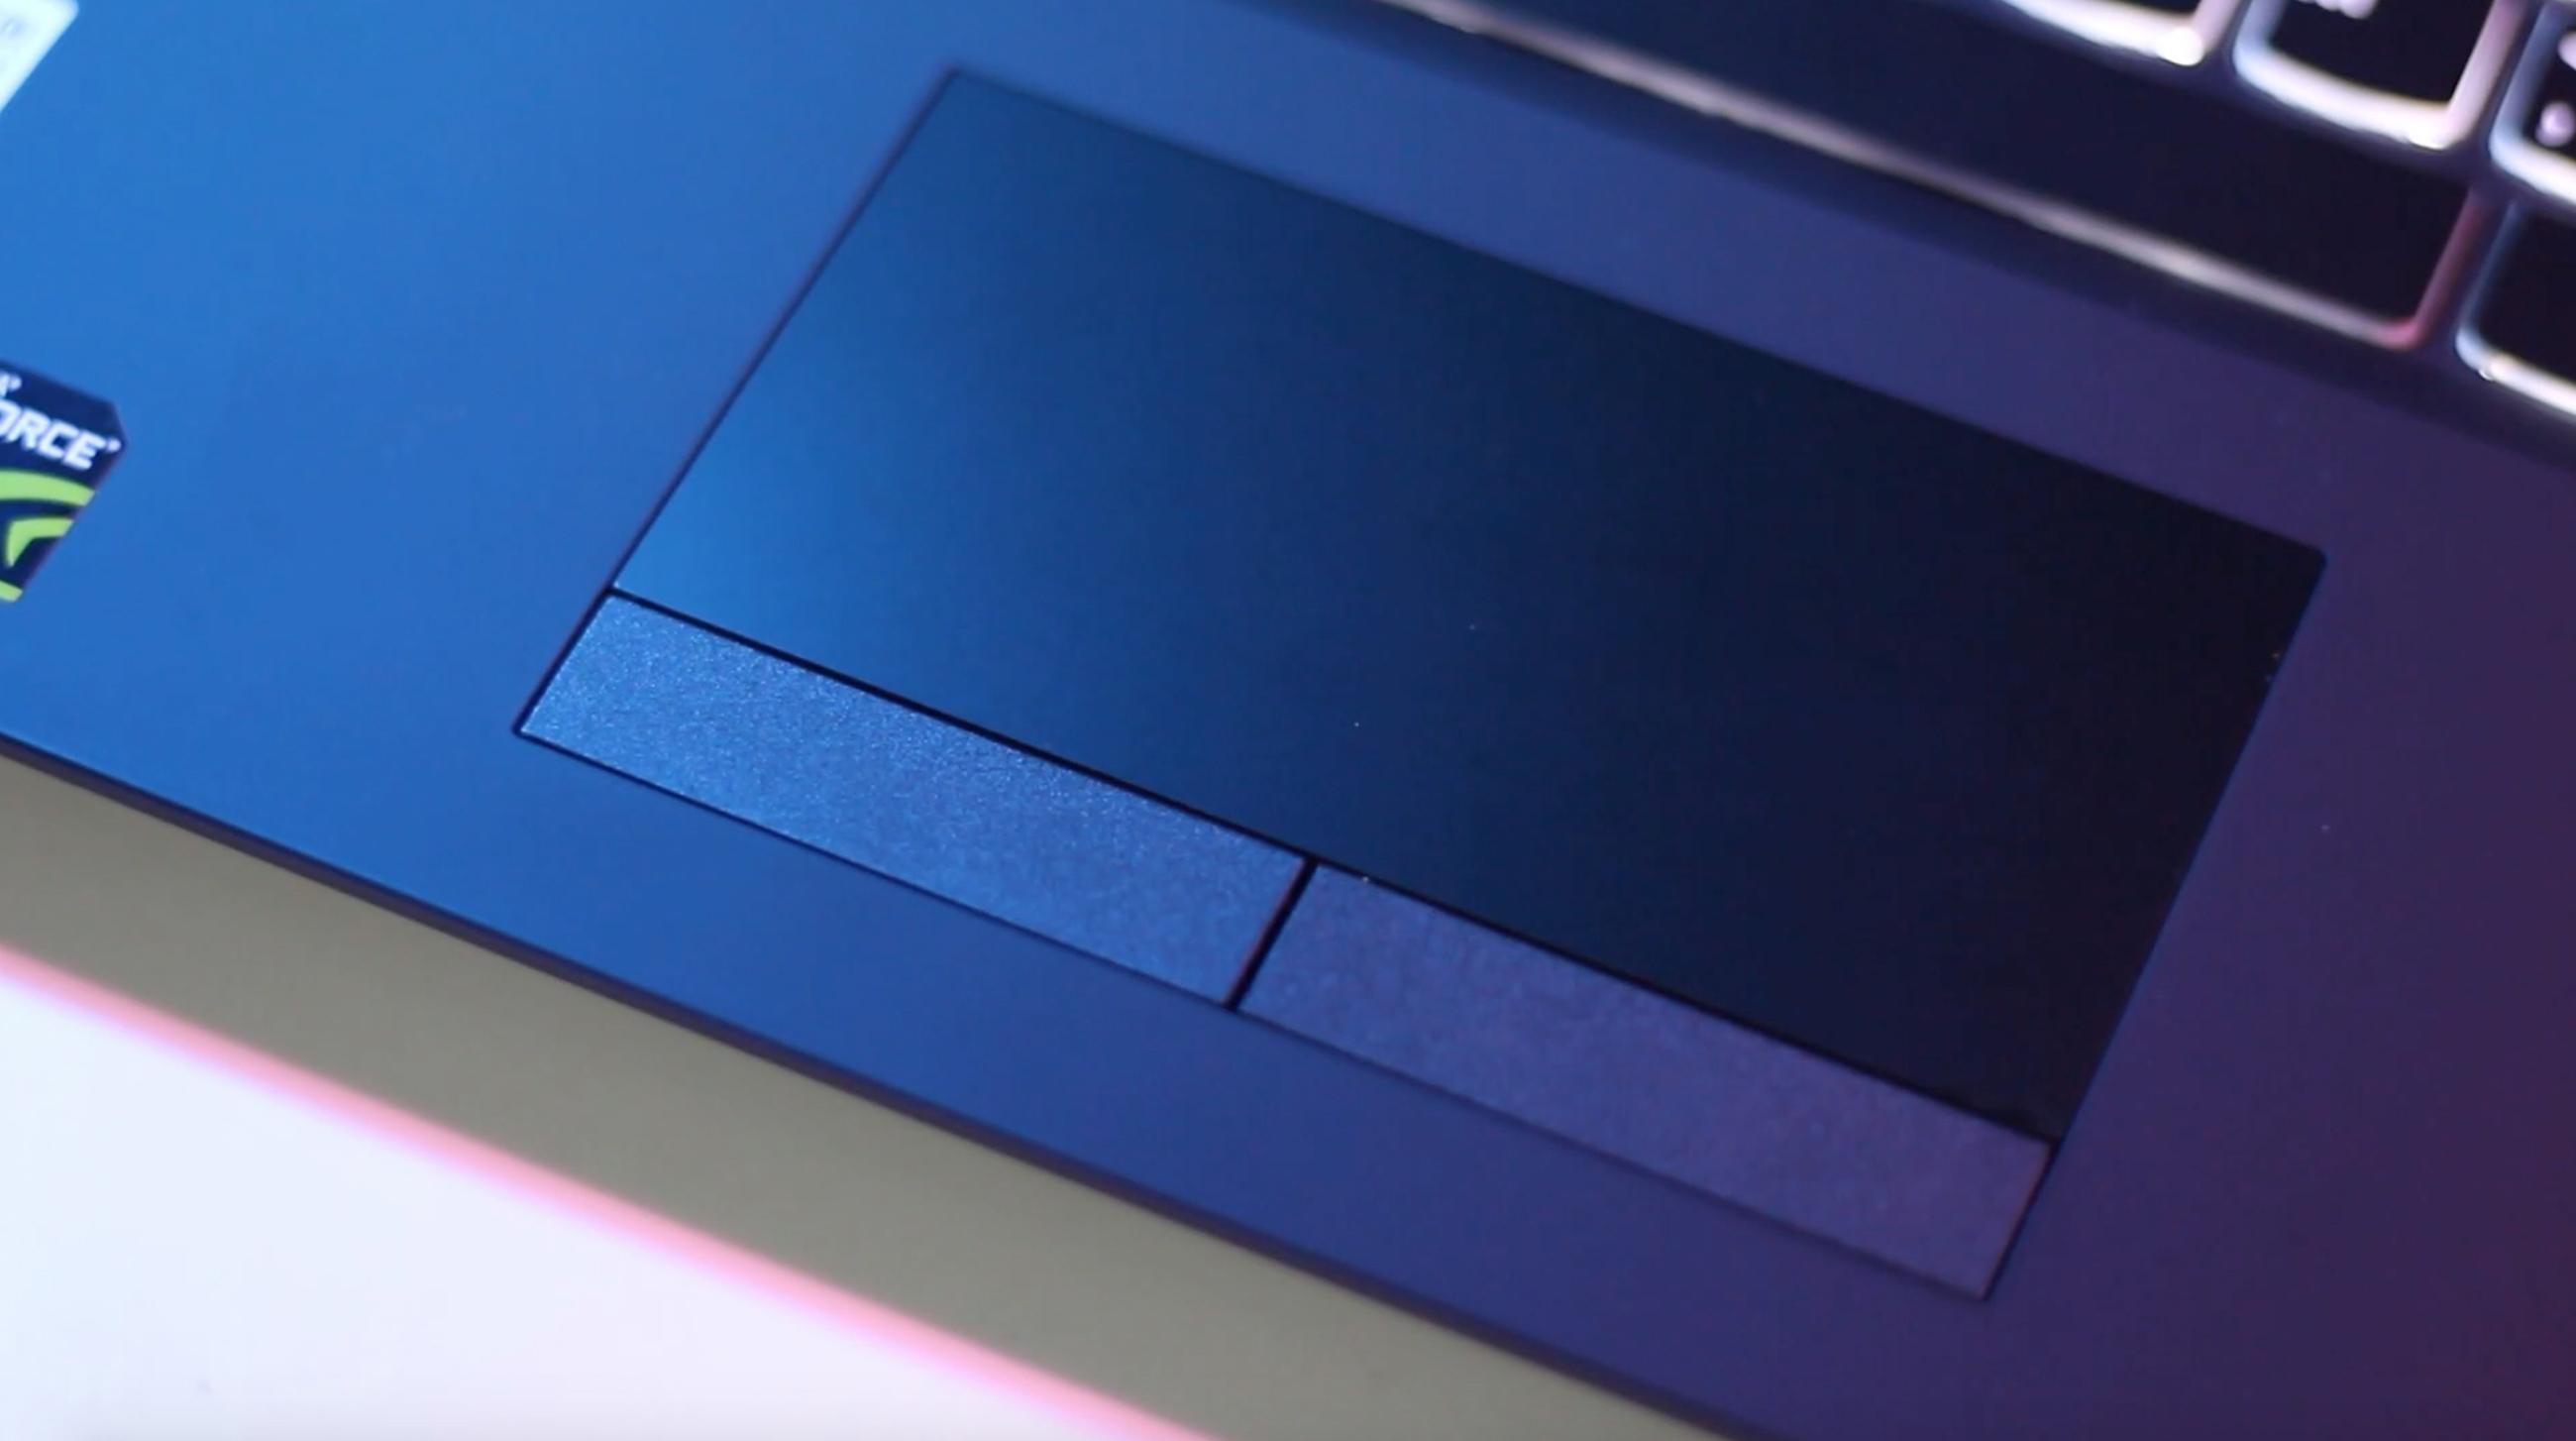 Legion Y530 vem com um touchpad grande